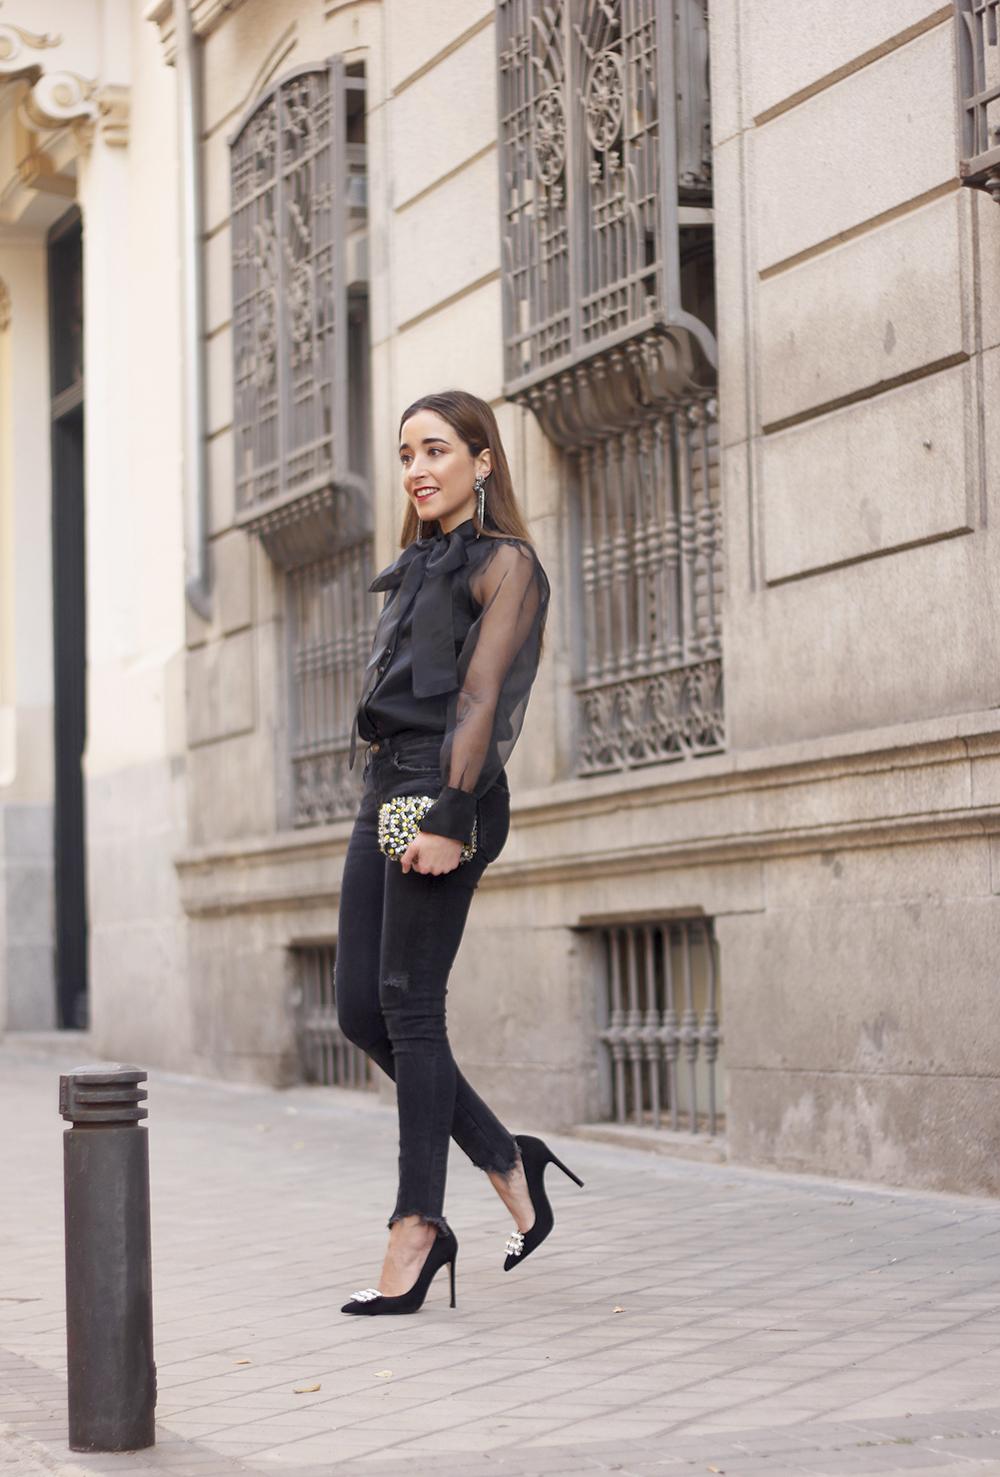 black shirt jeans christmas look fashion street style xmas 20188649